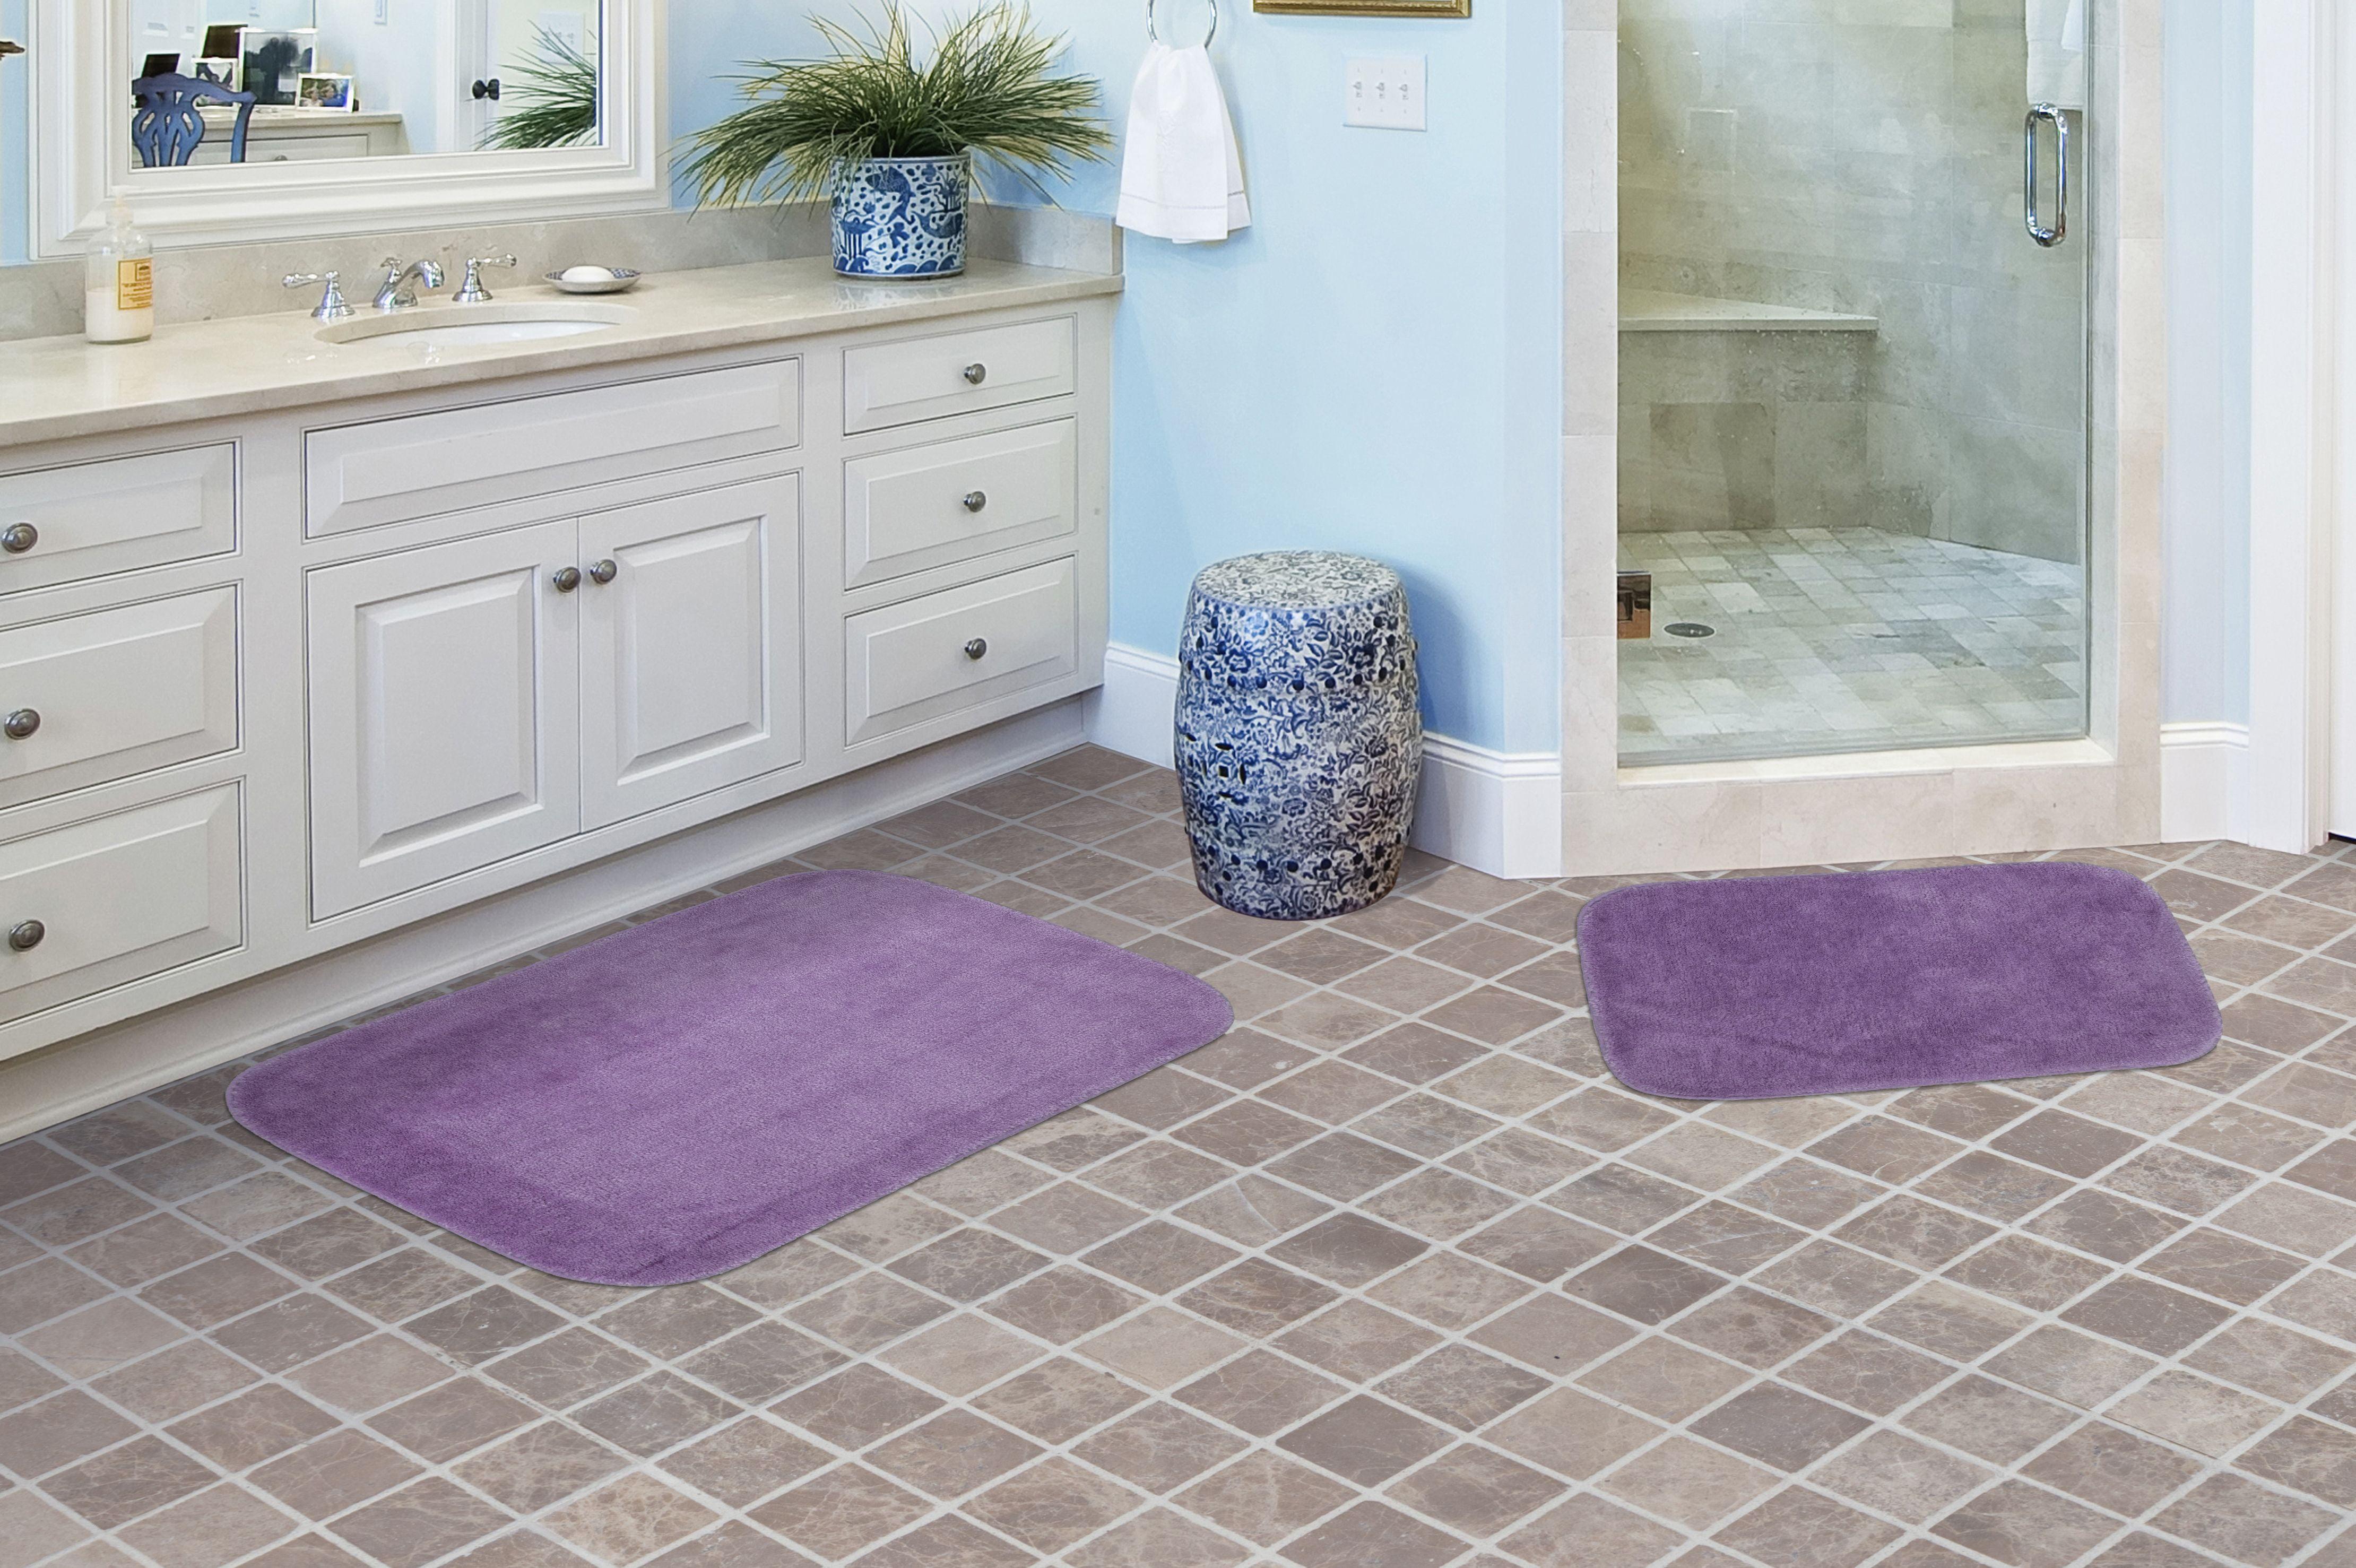 2 Piece Traditional Soft and Plush Nylon Washable Bathroom ...